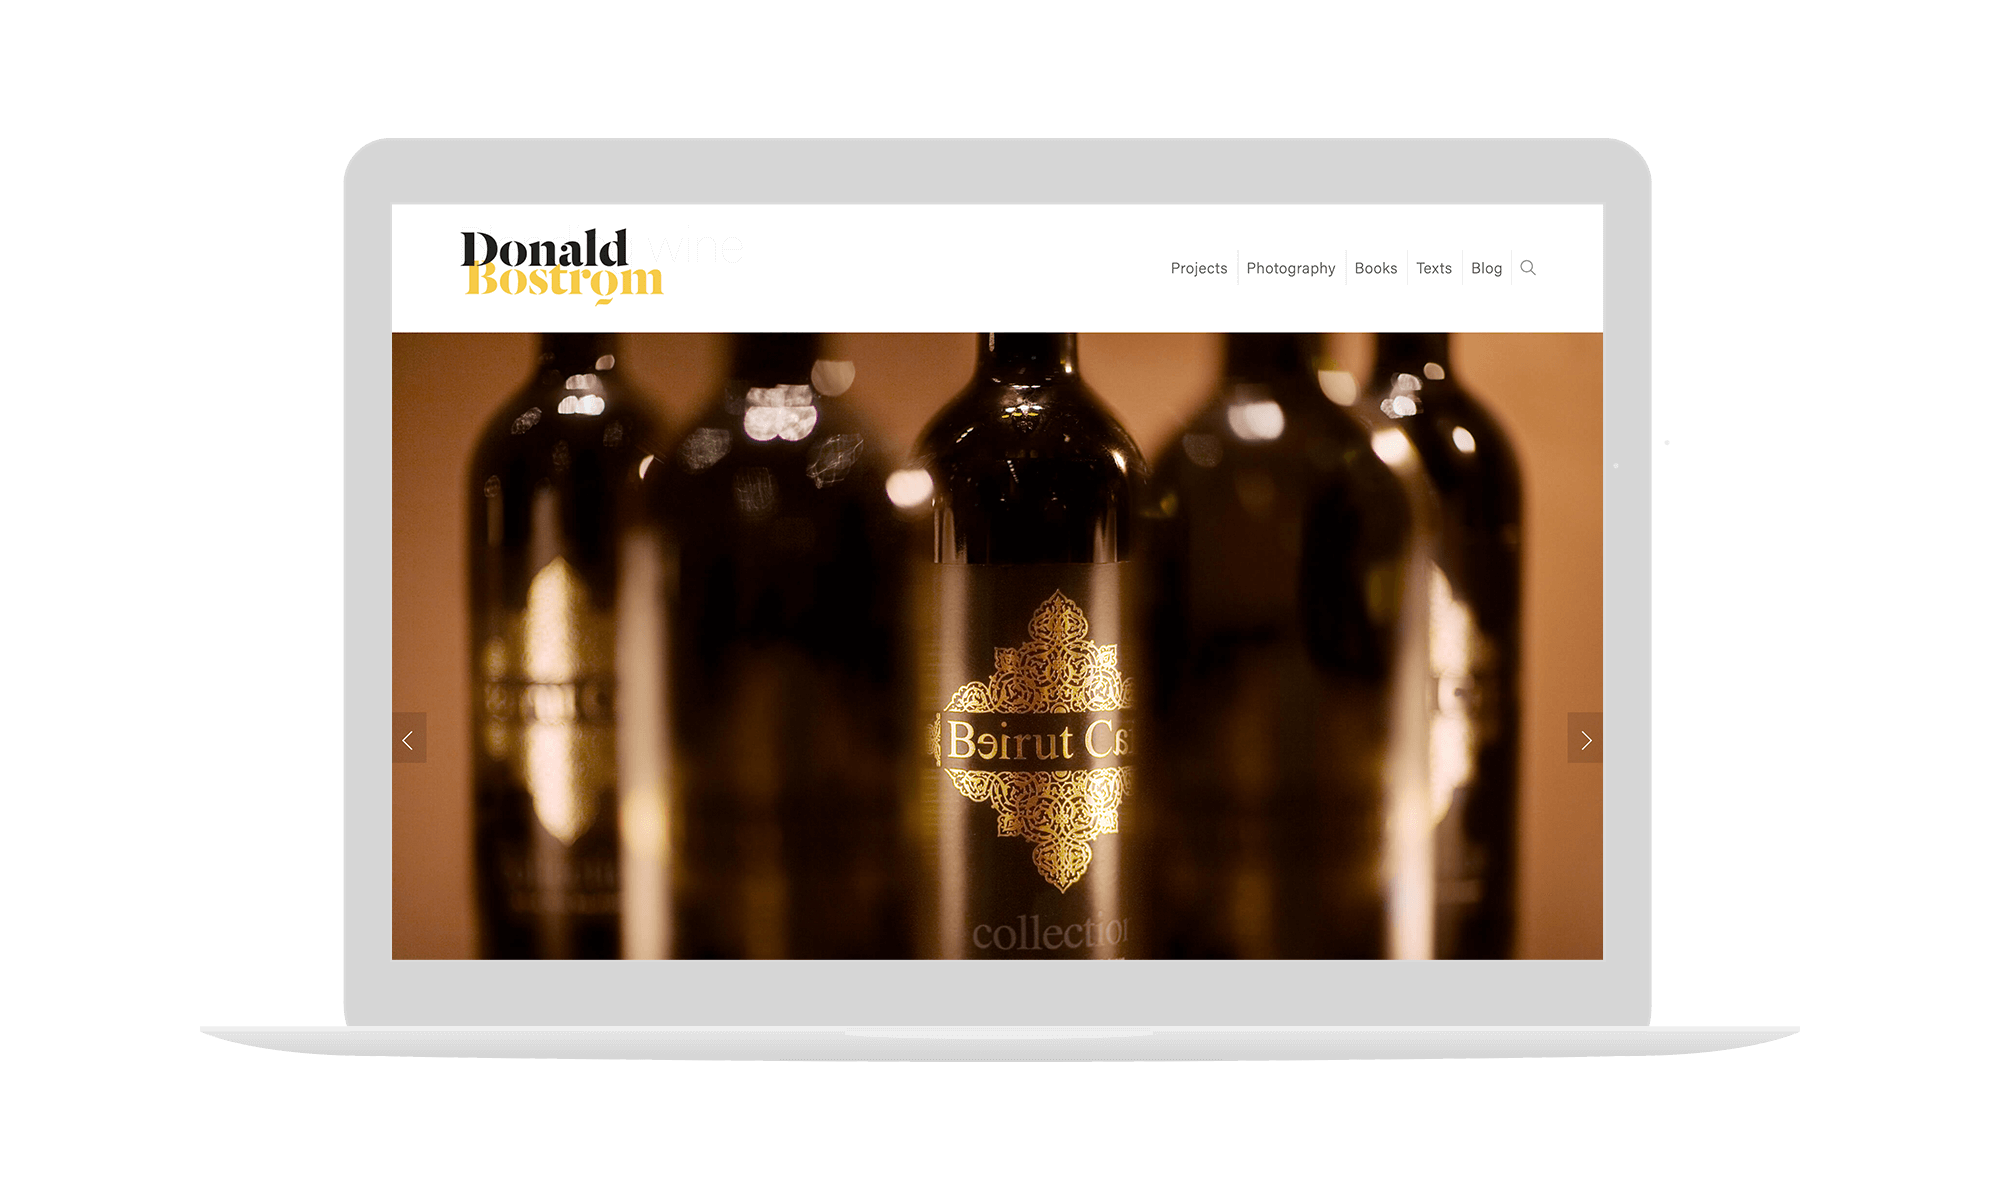 donaldbostrom.com